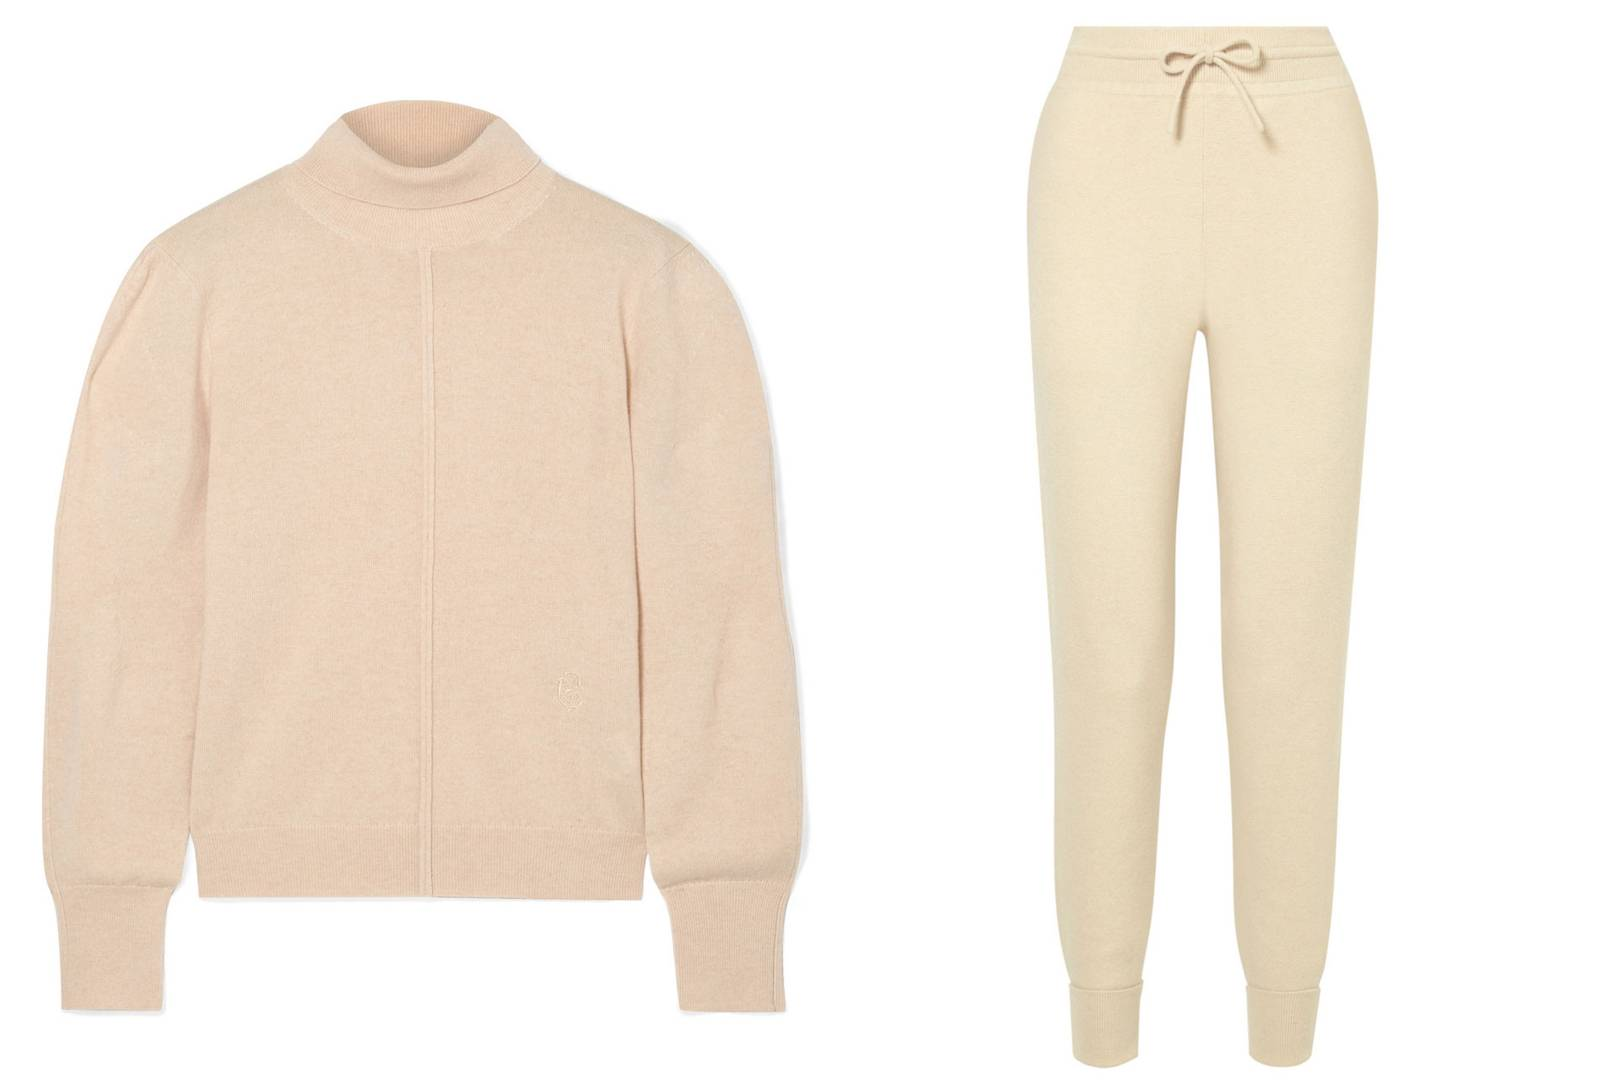 b0b831bdb49e6 Tracksuits To Wear This Winter | British Vogue